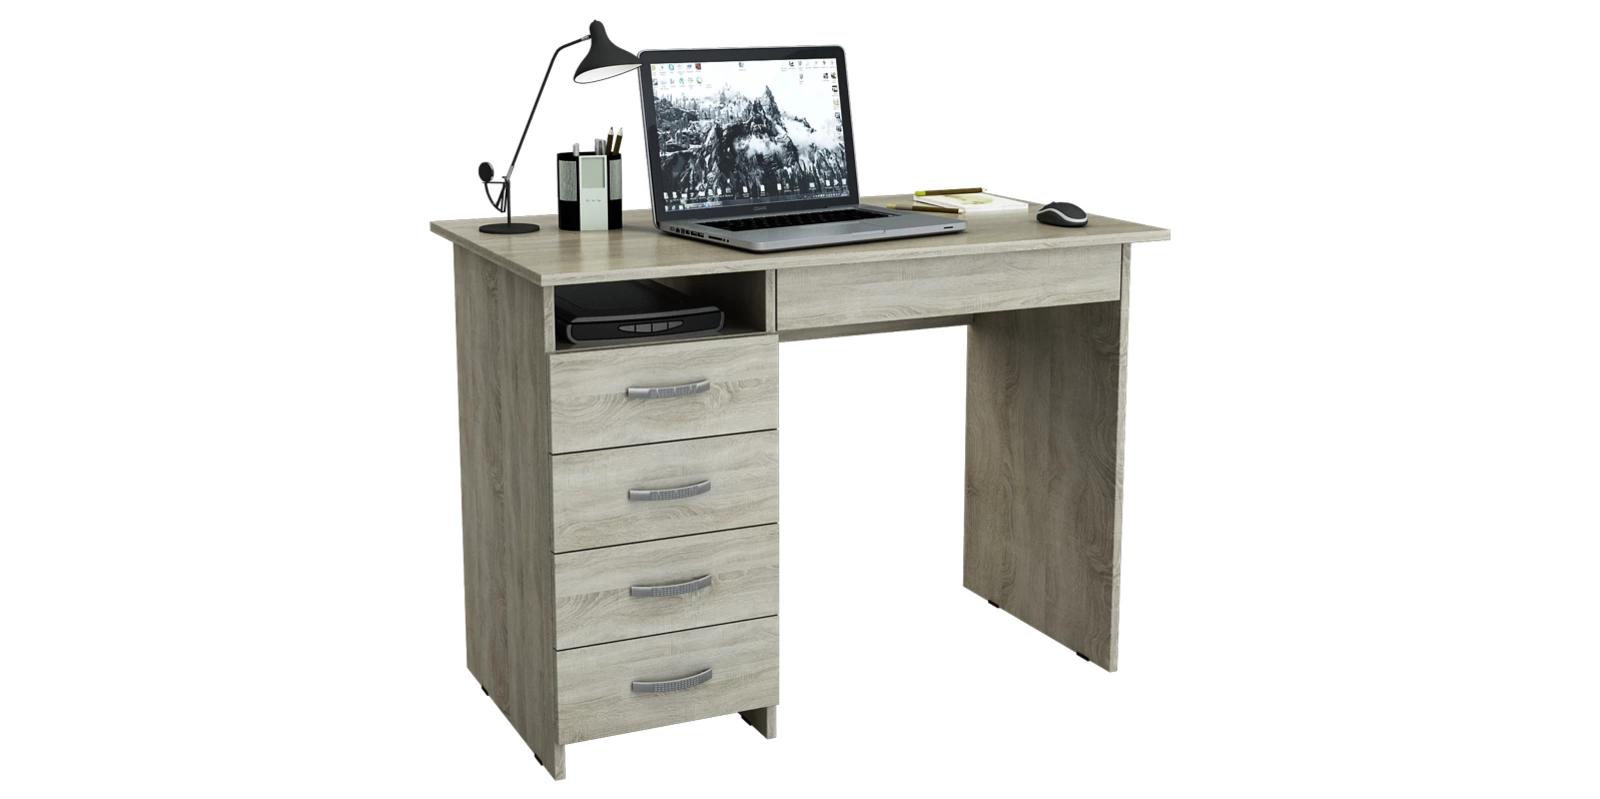 Письменный стол Харви вариант №1 (дуб сонома)